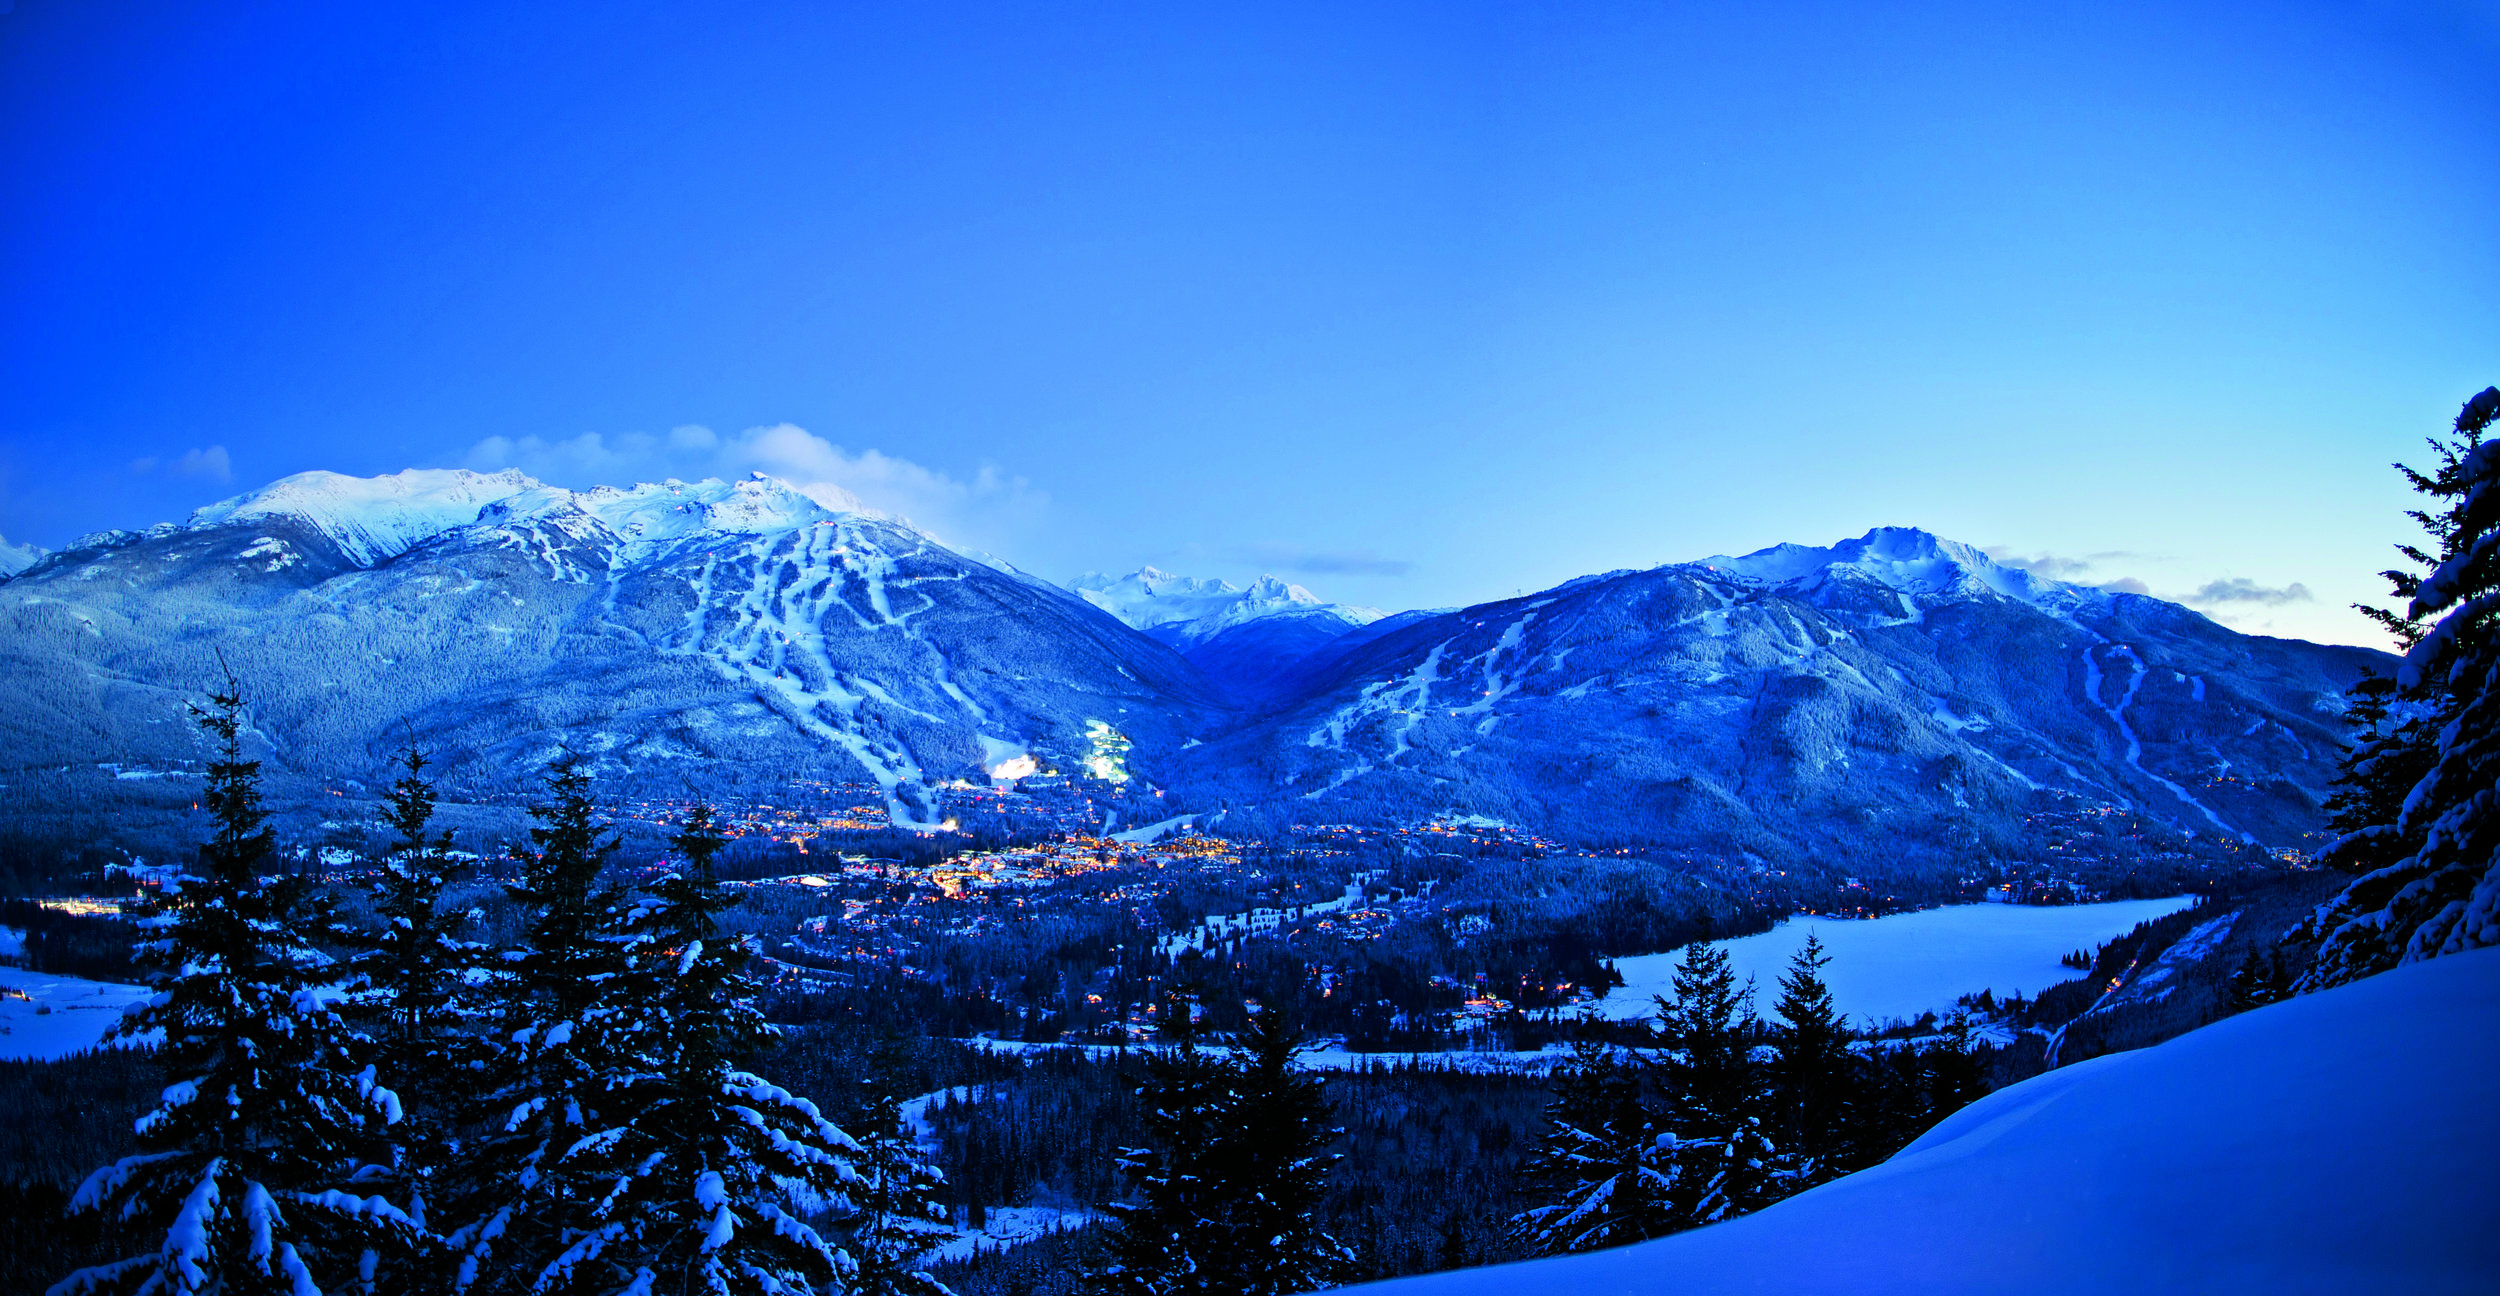 Whistler Blackcomb, British Columbia.